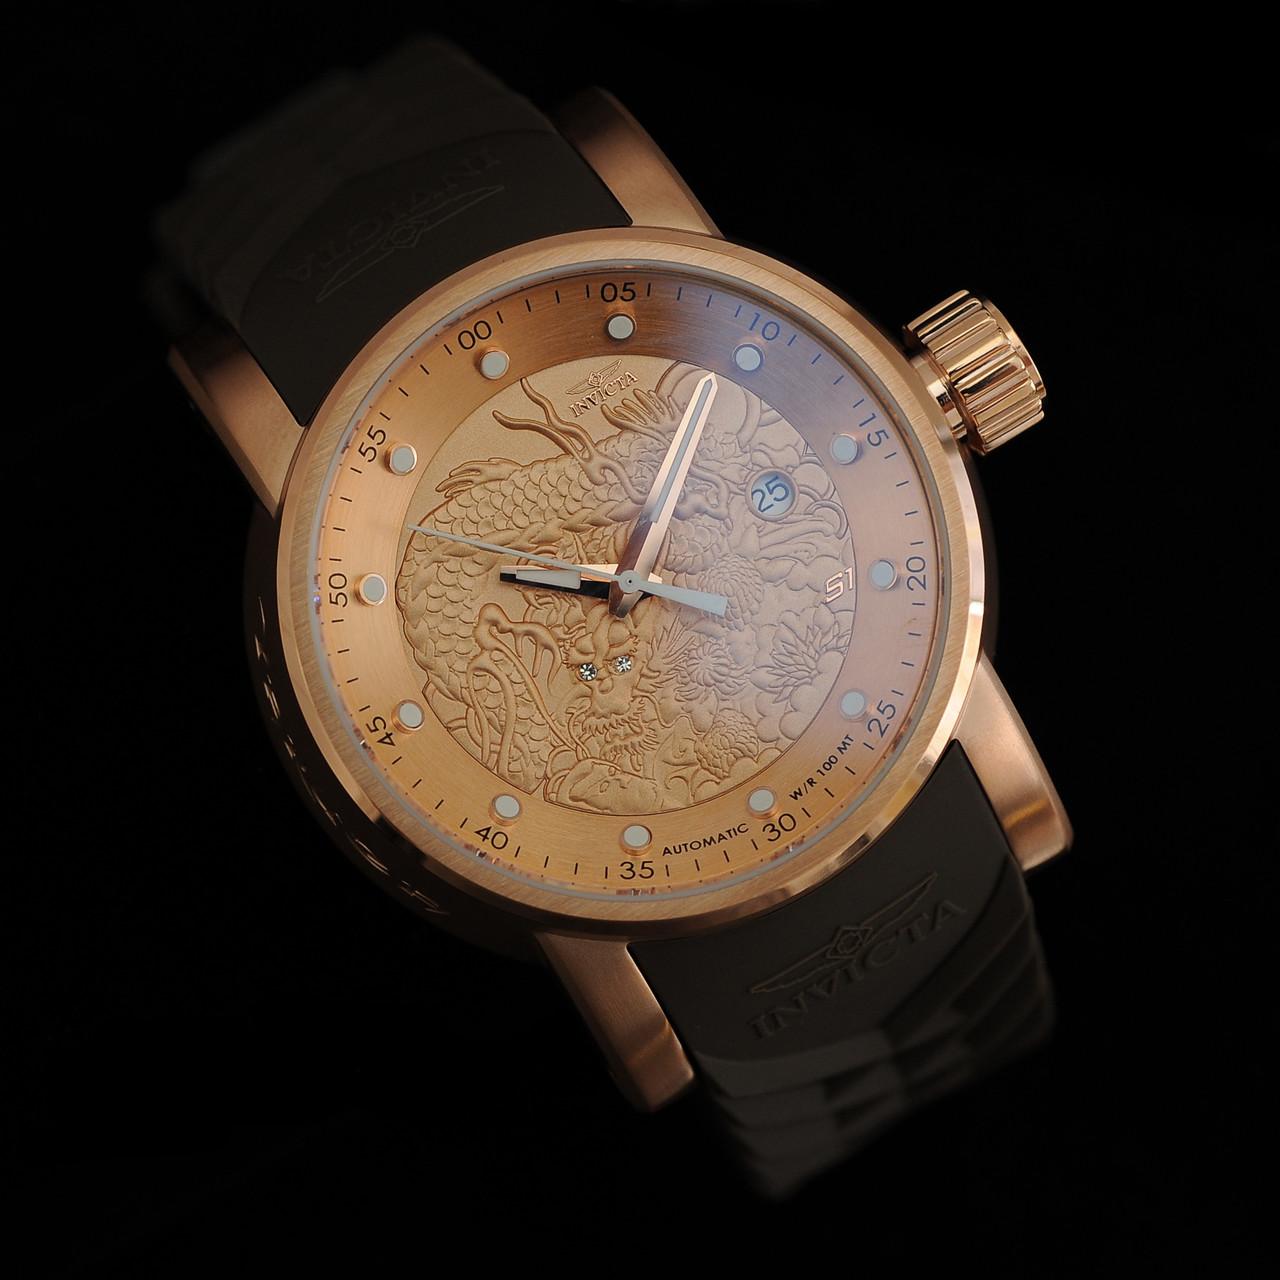 5a57d414a4a8 Женские часы Invicta 12790 Yakuza Dragon, цена 5 941 грн., купить в ...